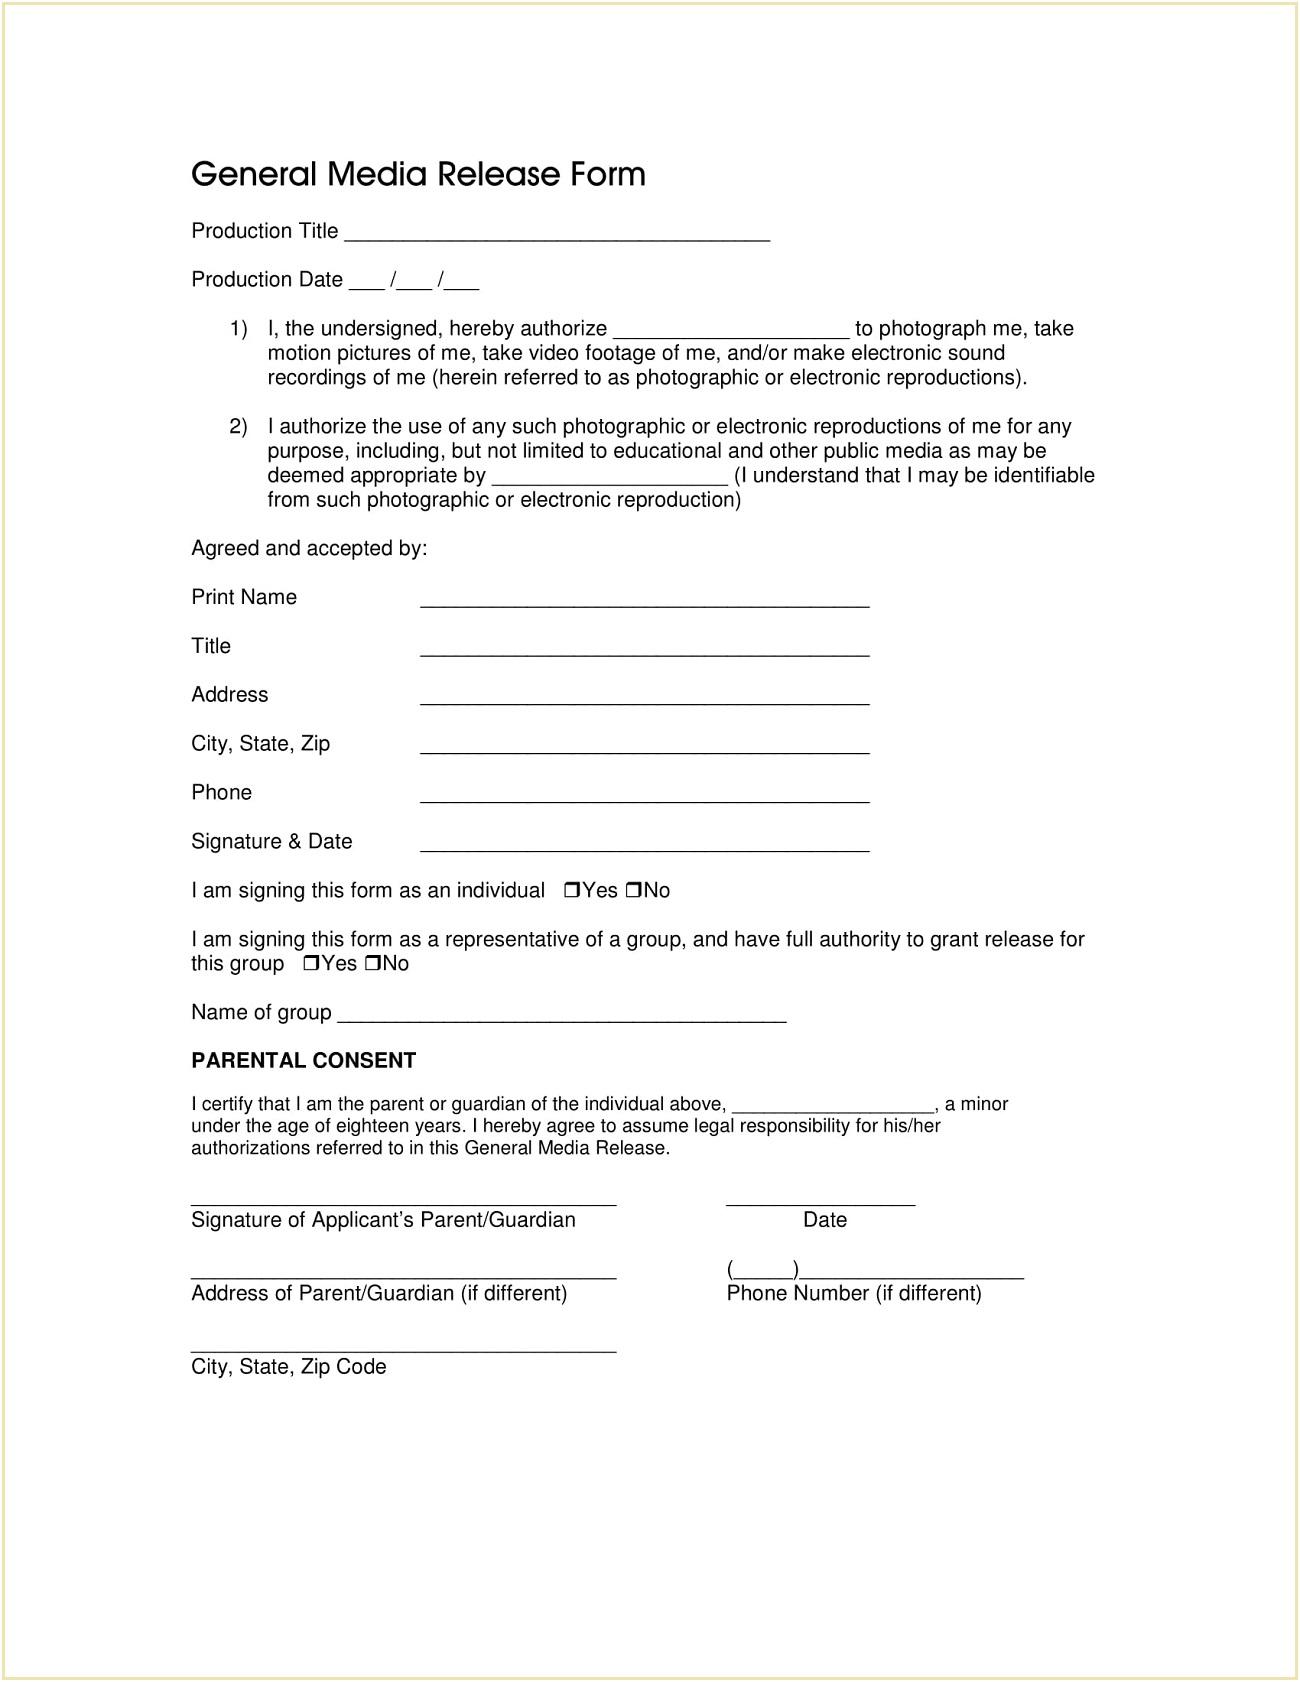 General Media Release Form Template PDF